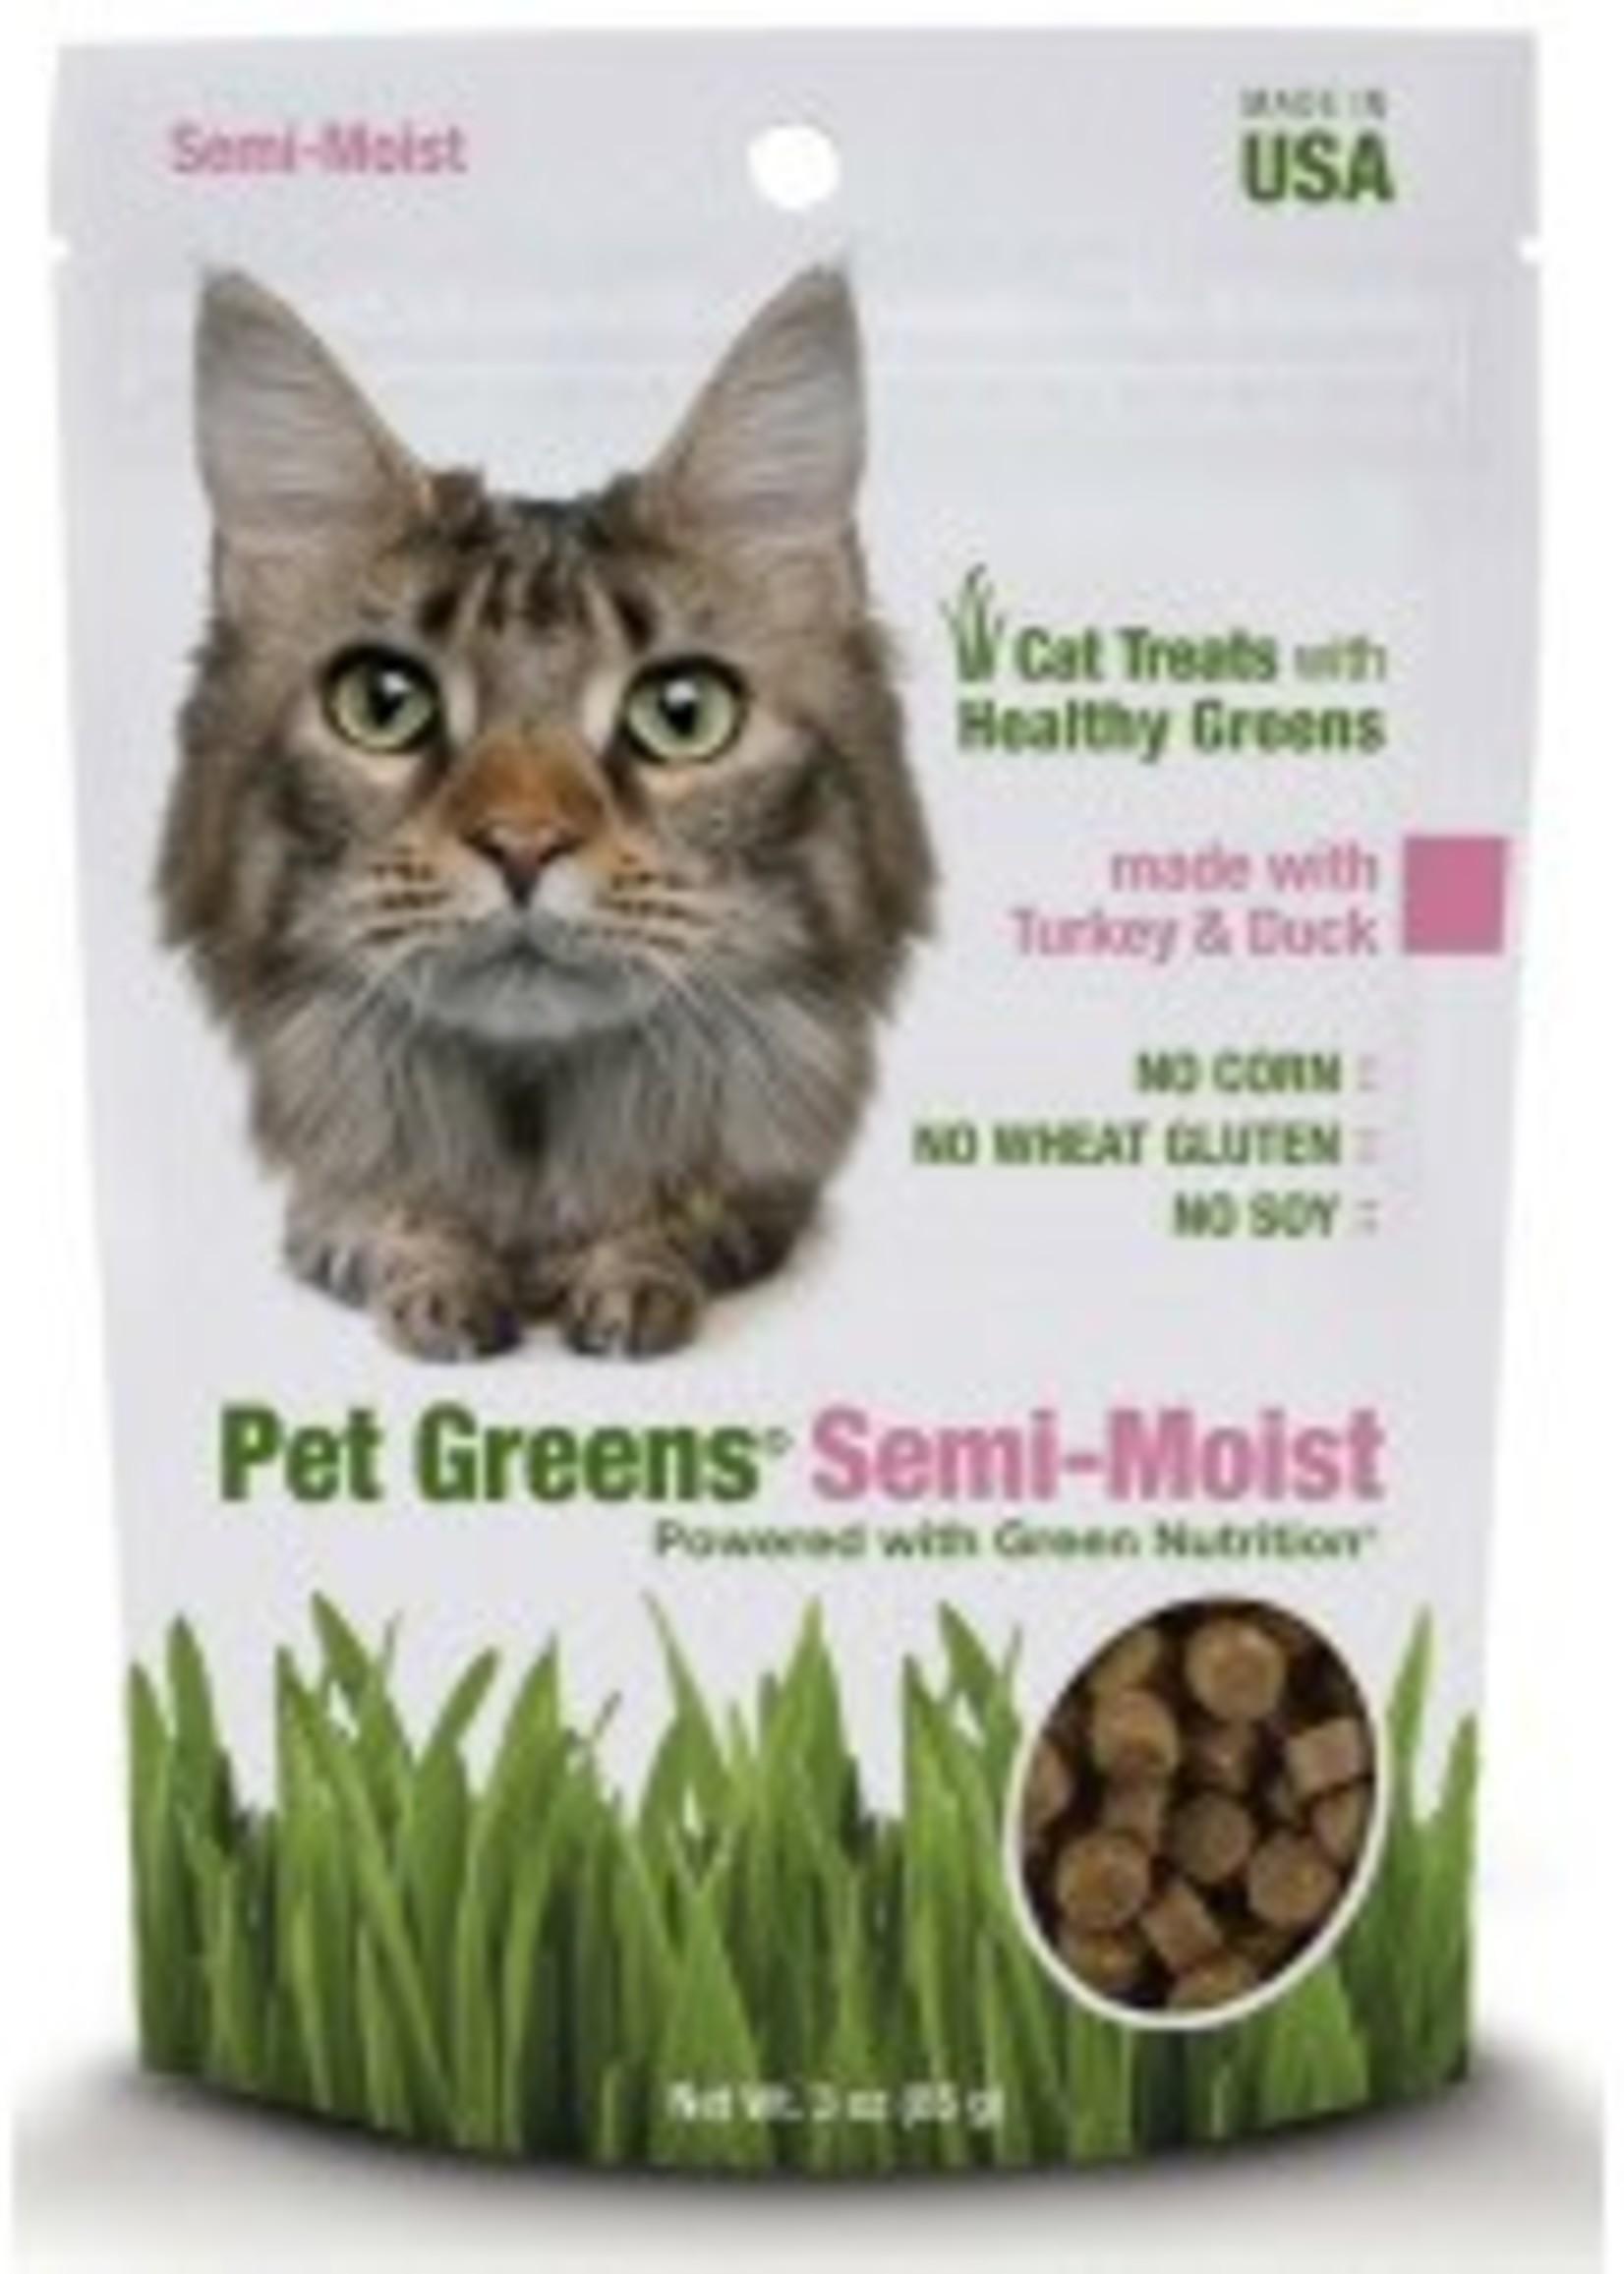 BELLROCK GROWERS INC Pet Greens Semi-moist Turkey & Duck 3oz